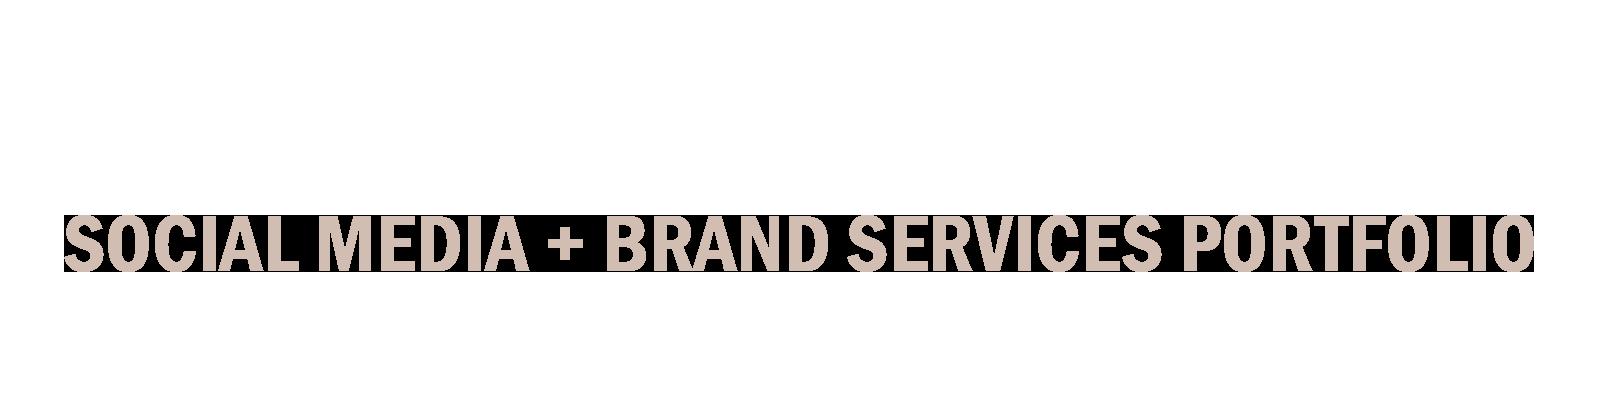 social media + brand services portfolio.png